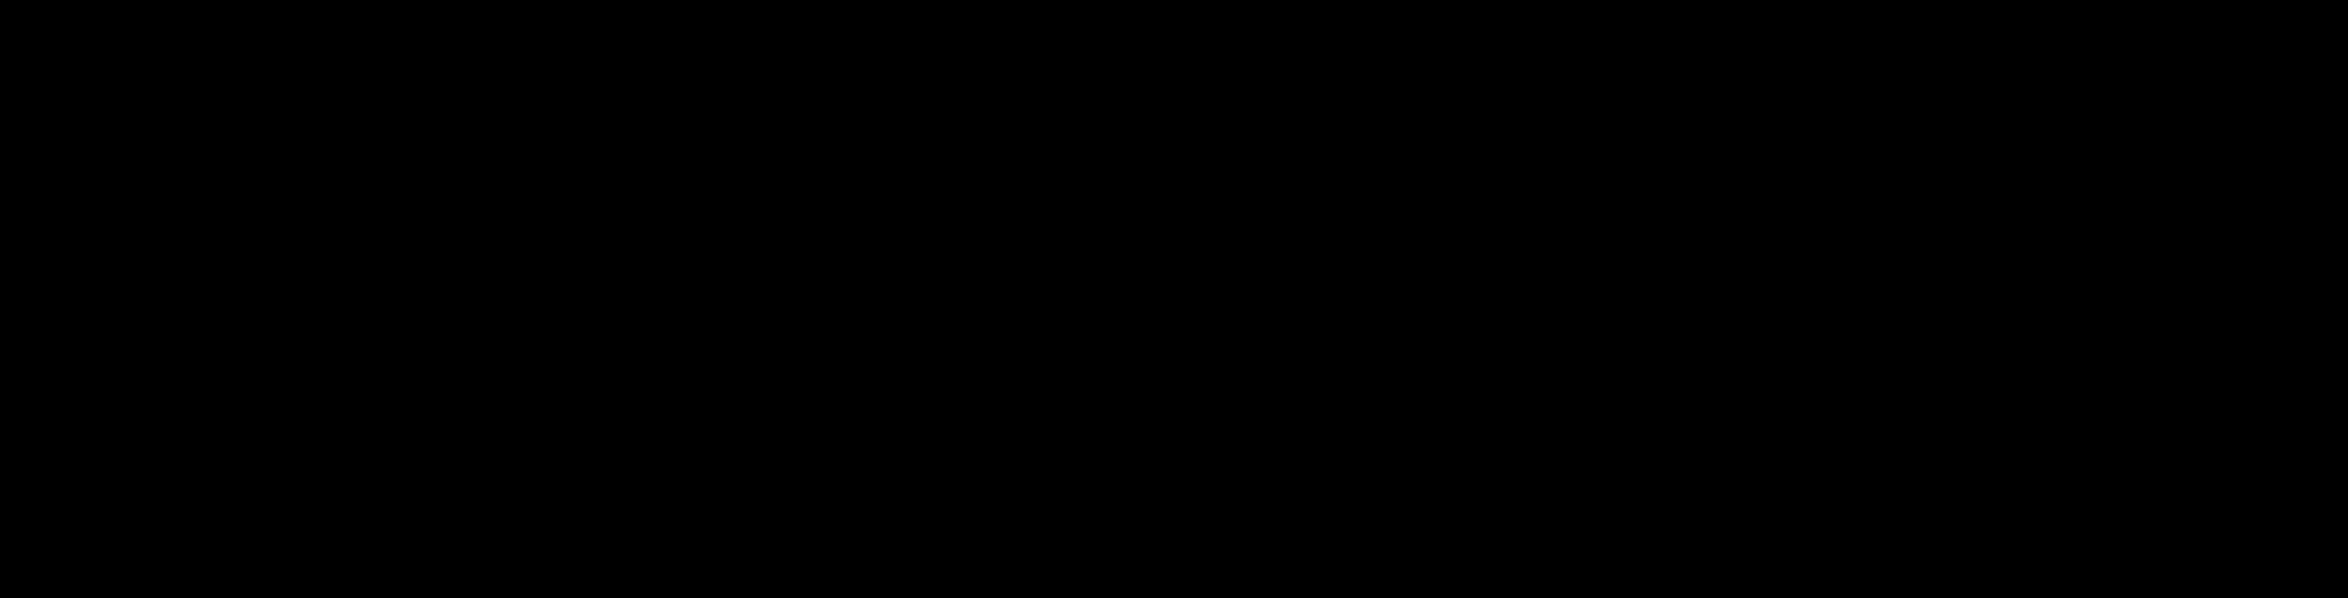 Clipart Yoga Typography Black